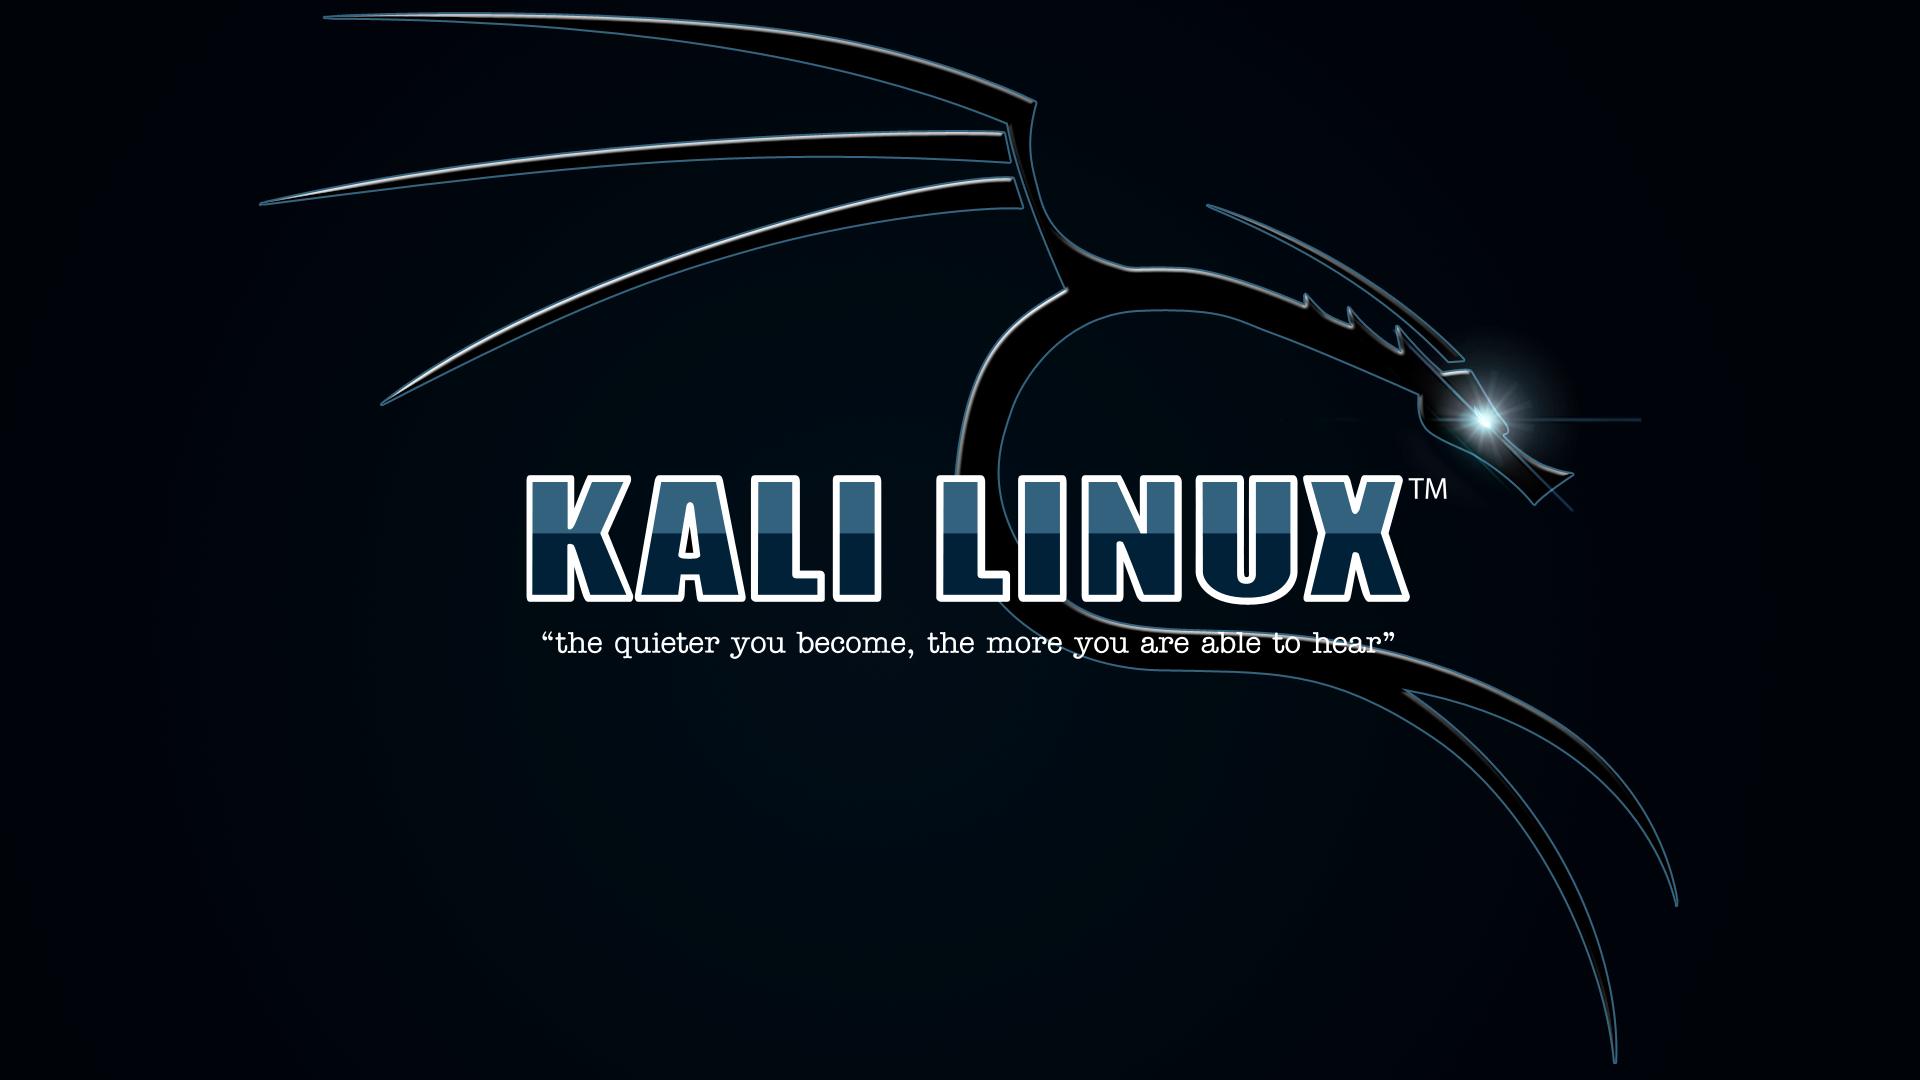 Kali Linux roadmap 2019-2020: Credit - Kali.org